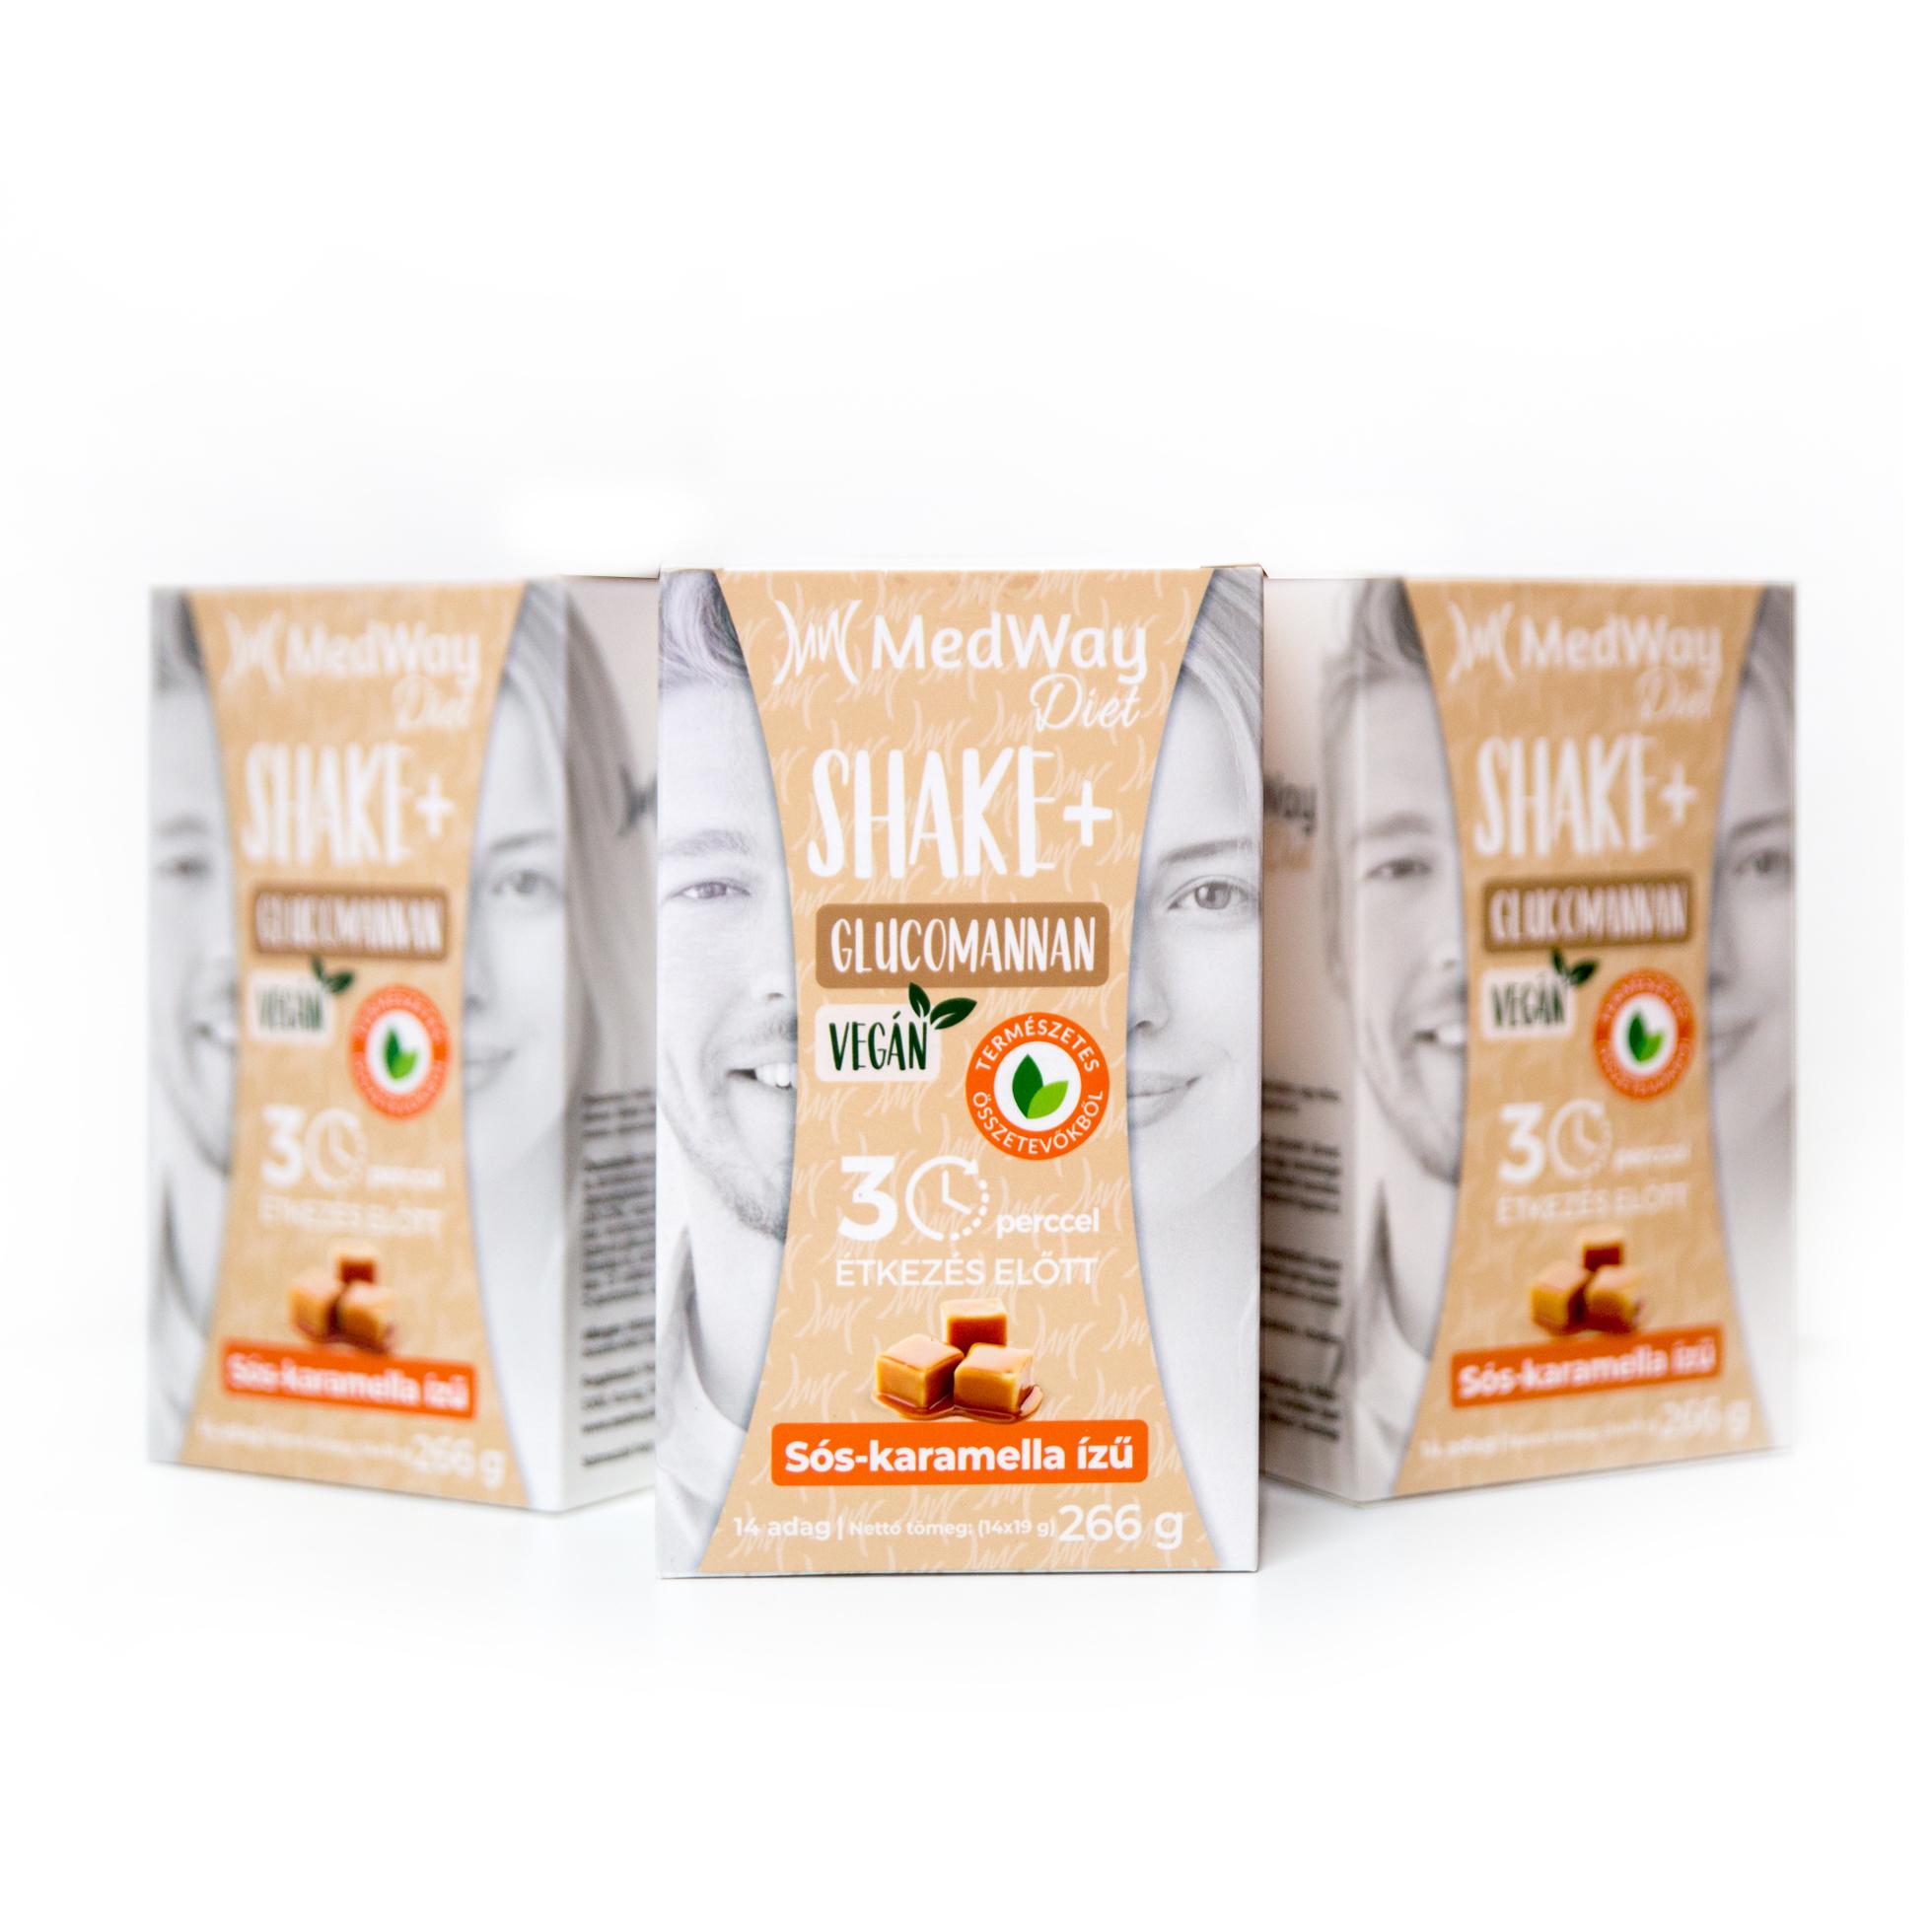 2 hetes MedWay Diet Vegán csomag - sós-karamella ízű glükomannánnal